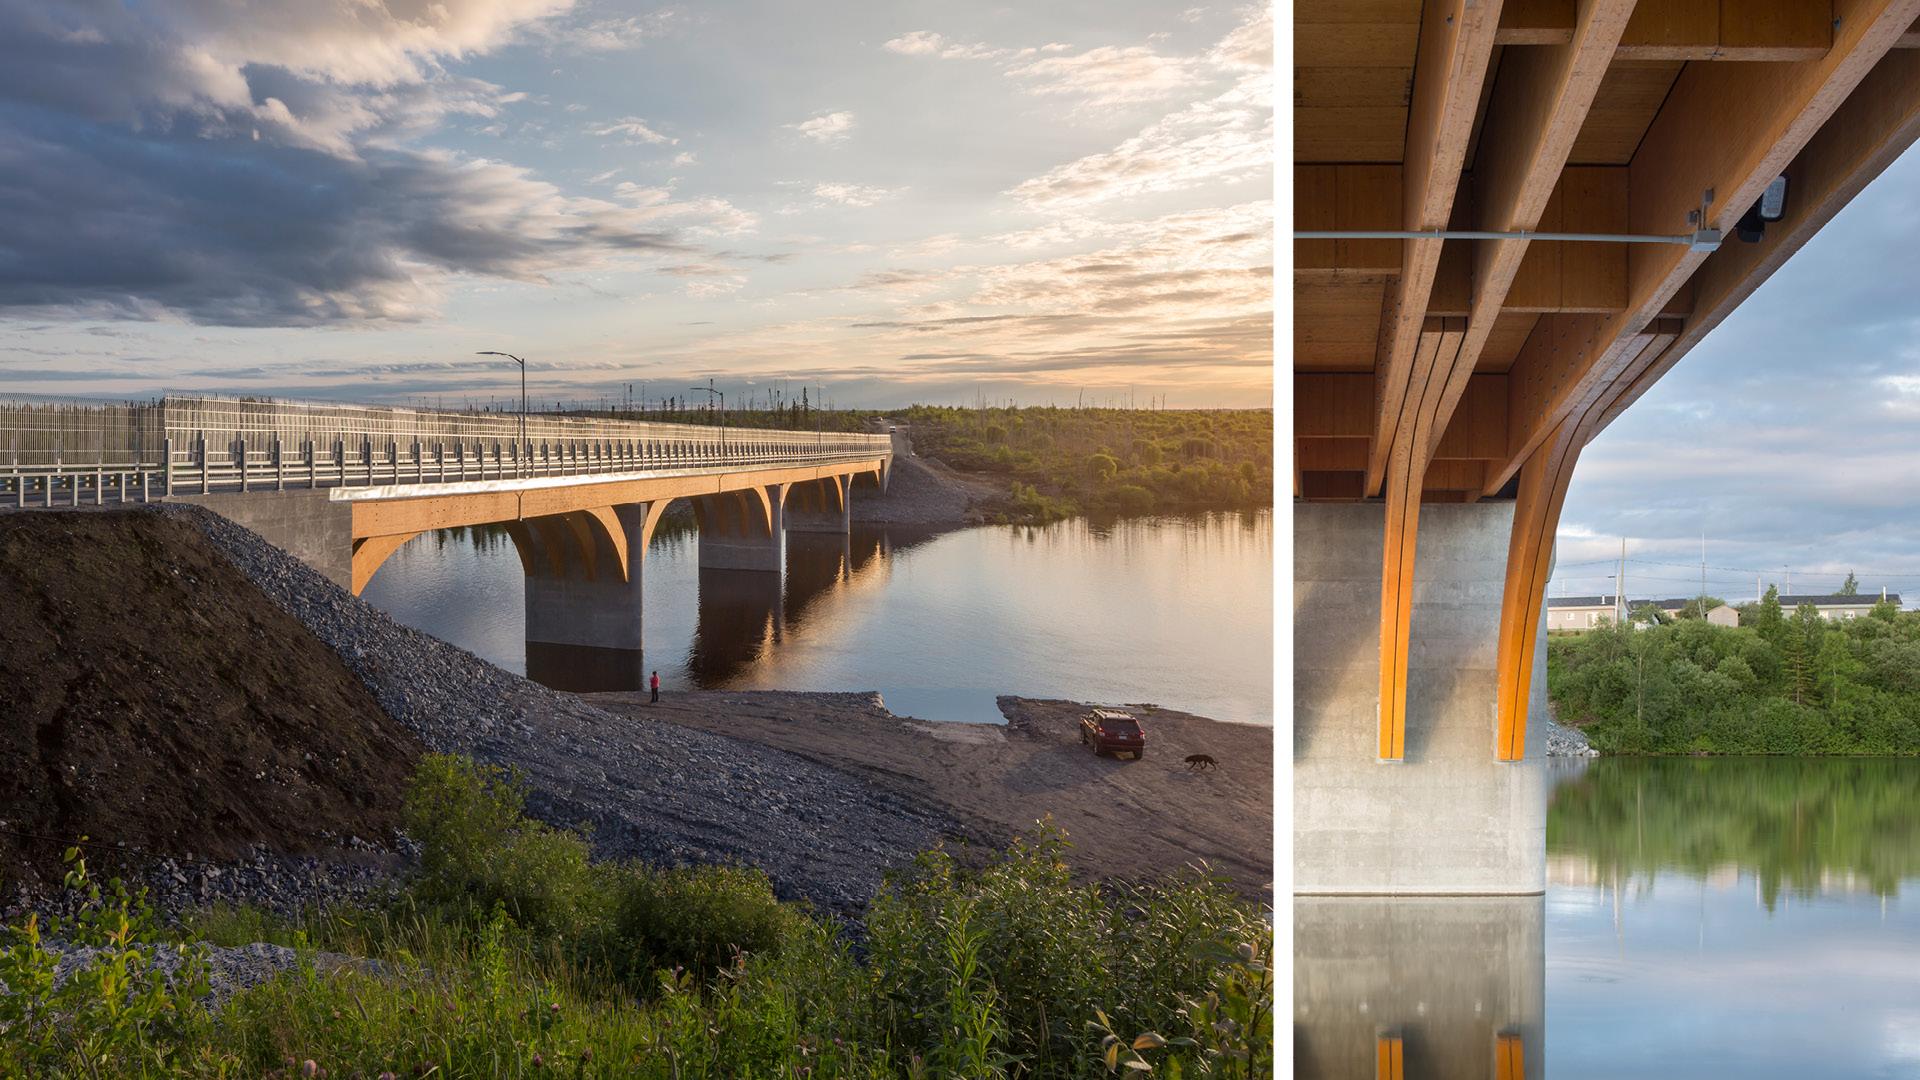 Un pont de bois  de 160 m  Mistissini  Joli Joli Design